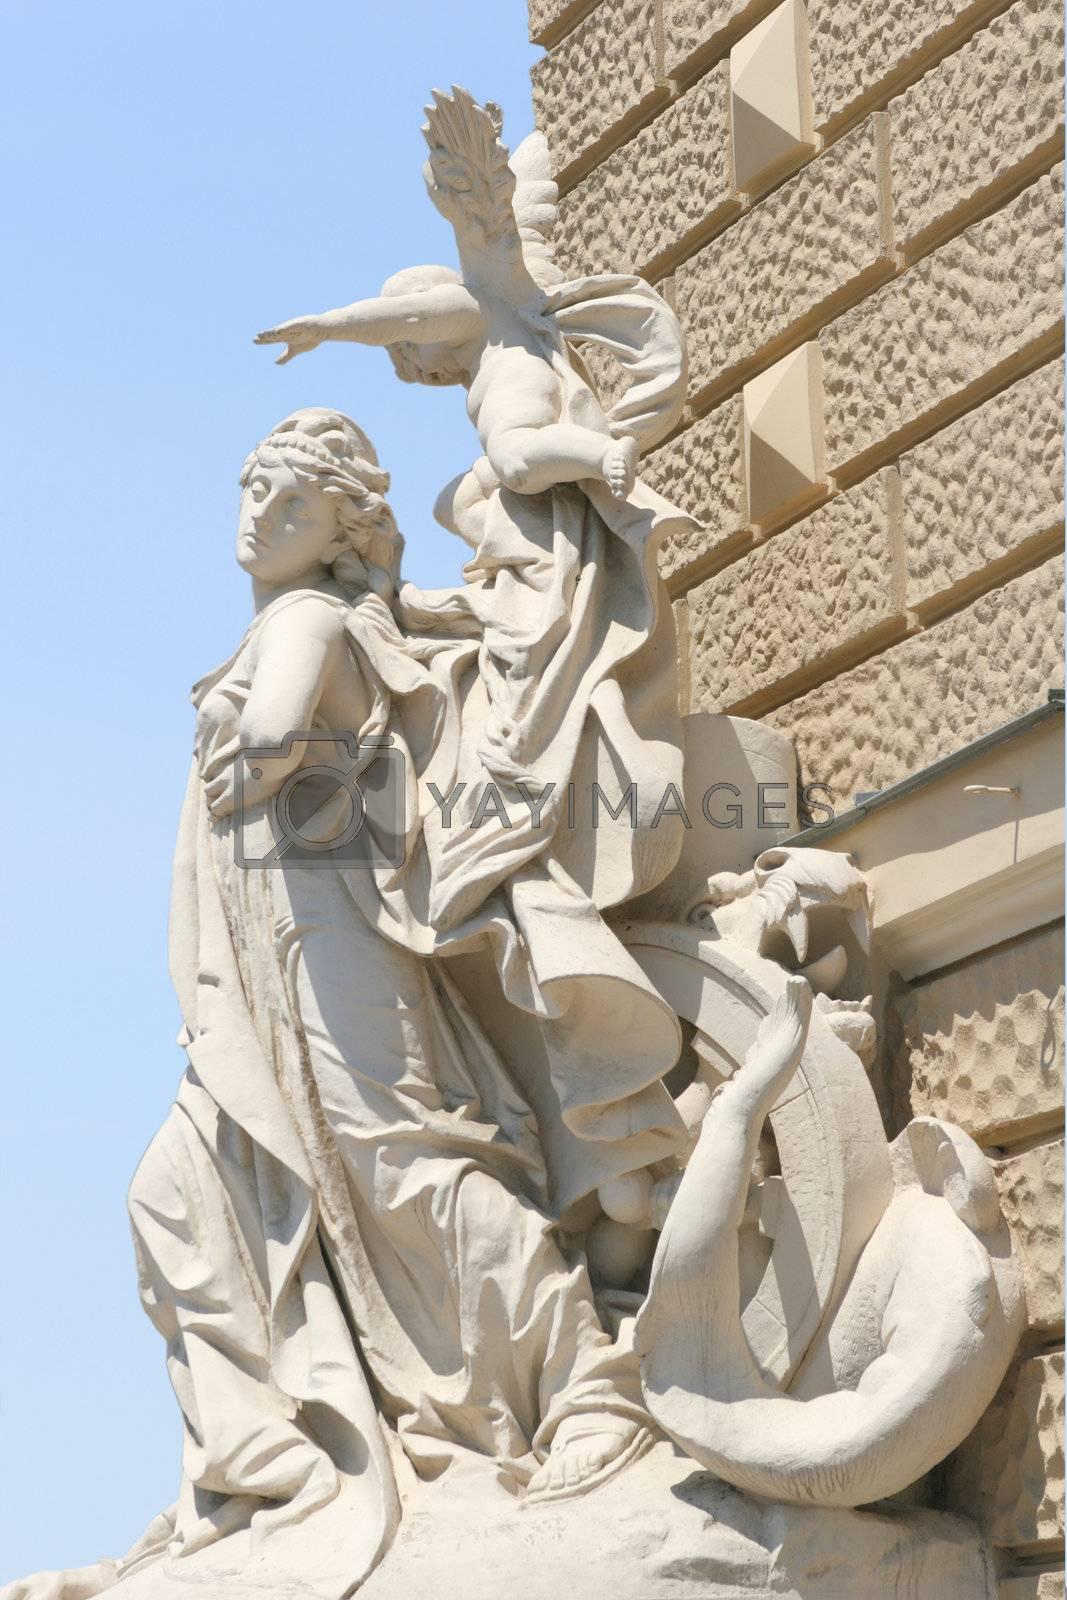 Antique Sculptural Composition by Astroid